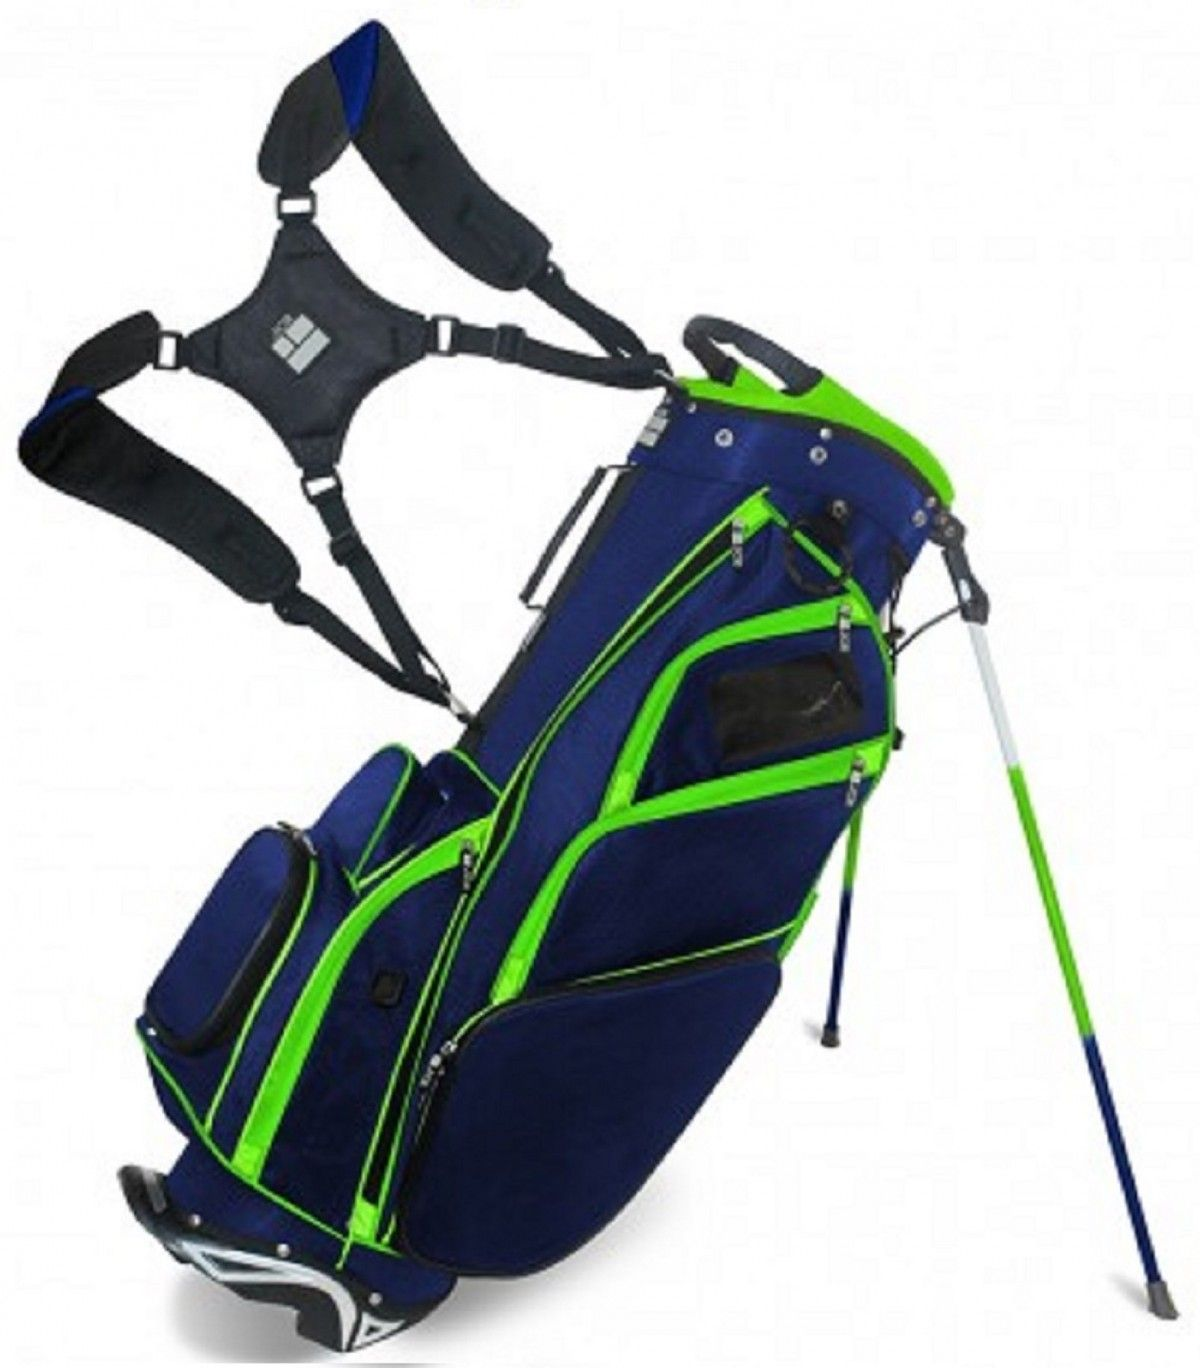 JCR DL550 Stand Bag from Golf & Ski Warehouse